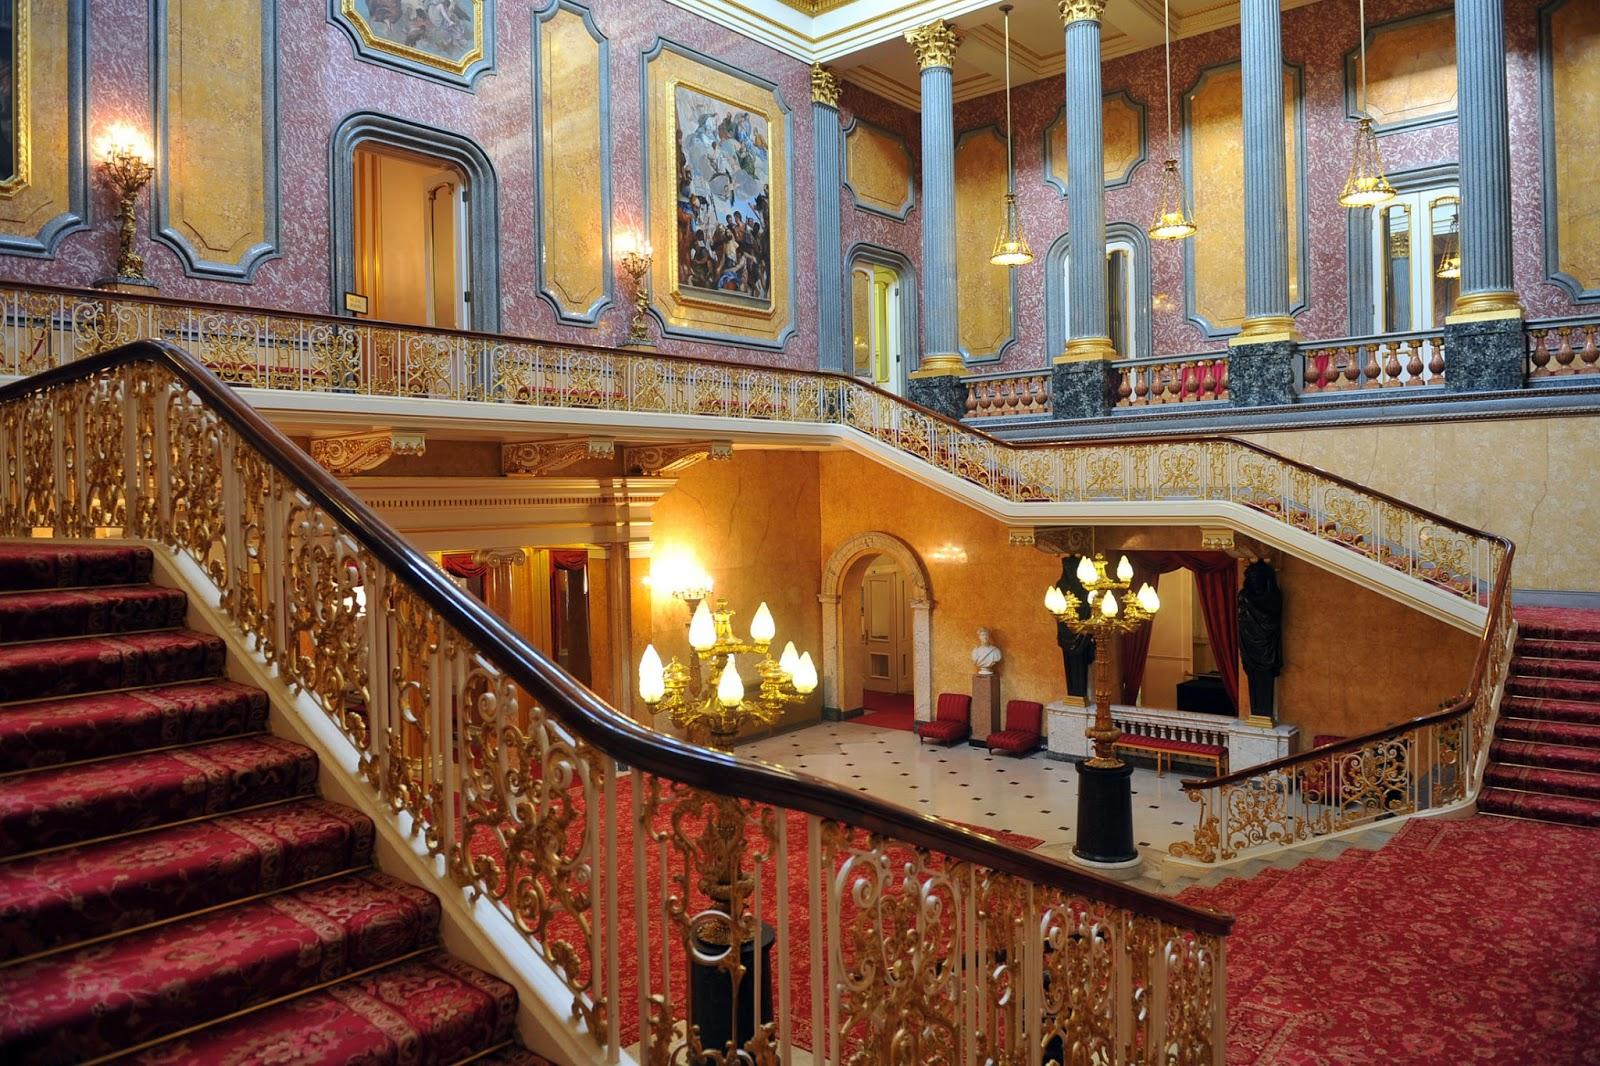 The Buckingham Palace | Most Visited Spot London | World ...